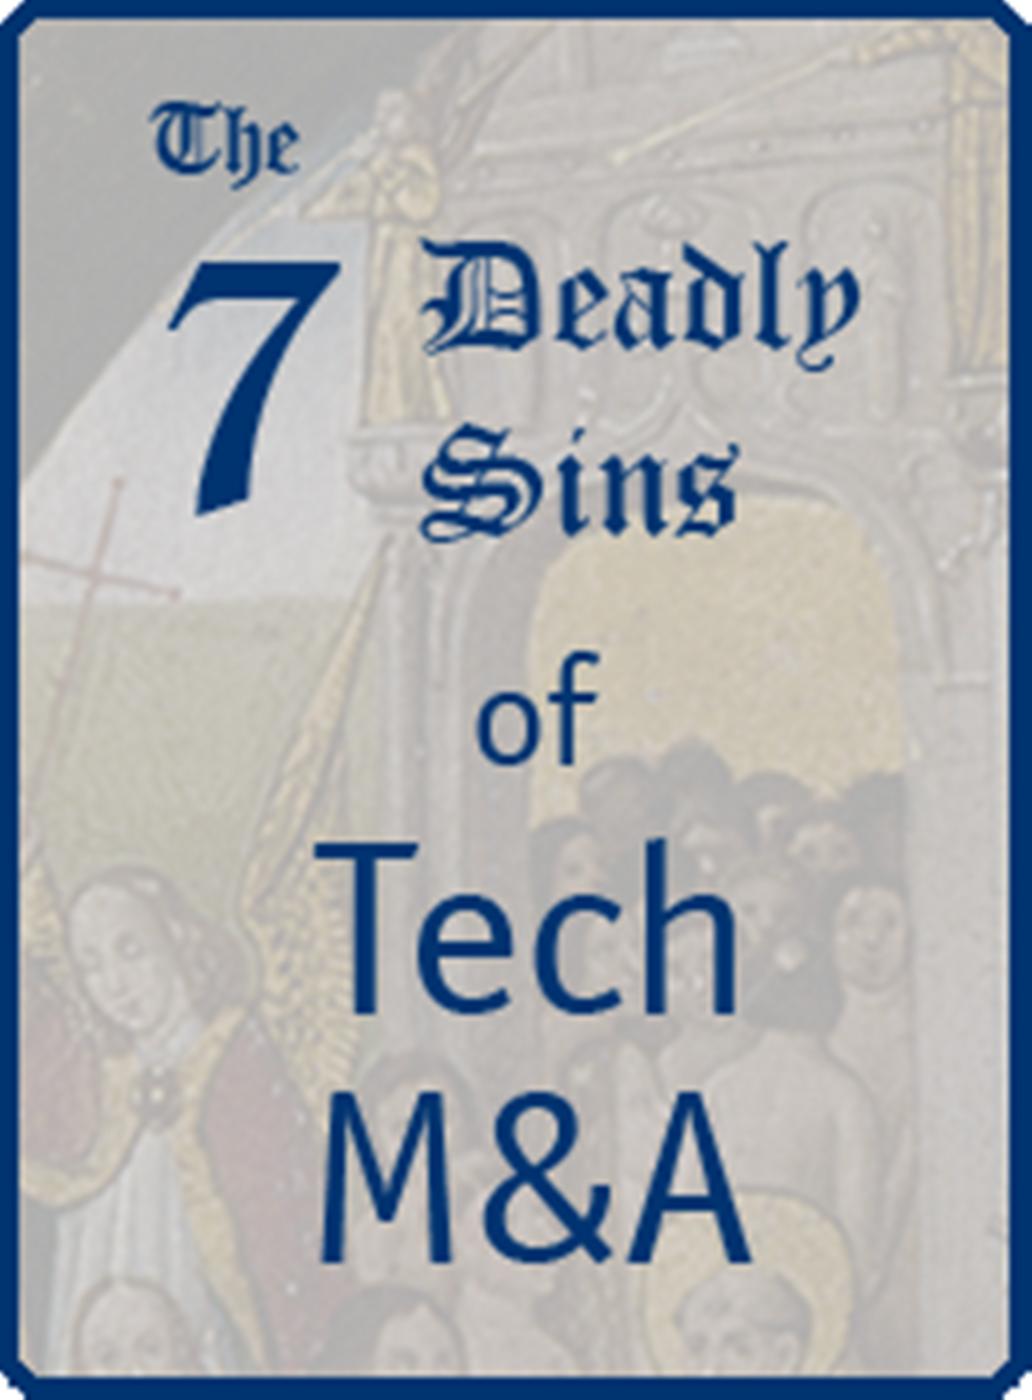 7 Deadly Sins of Tech M&A: #1